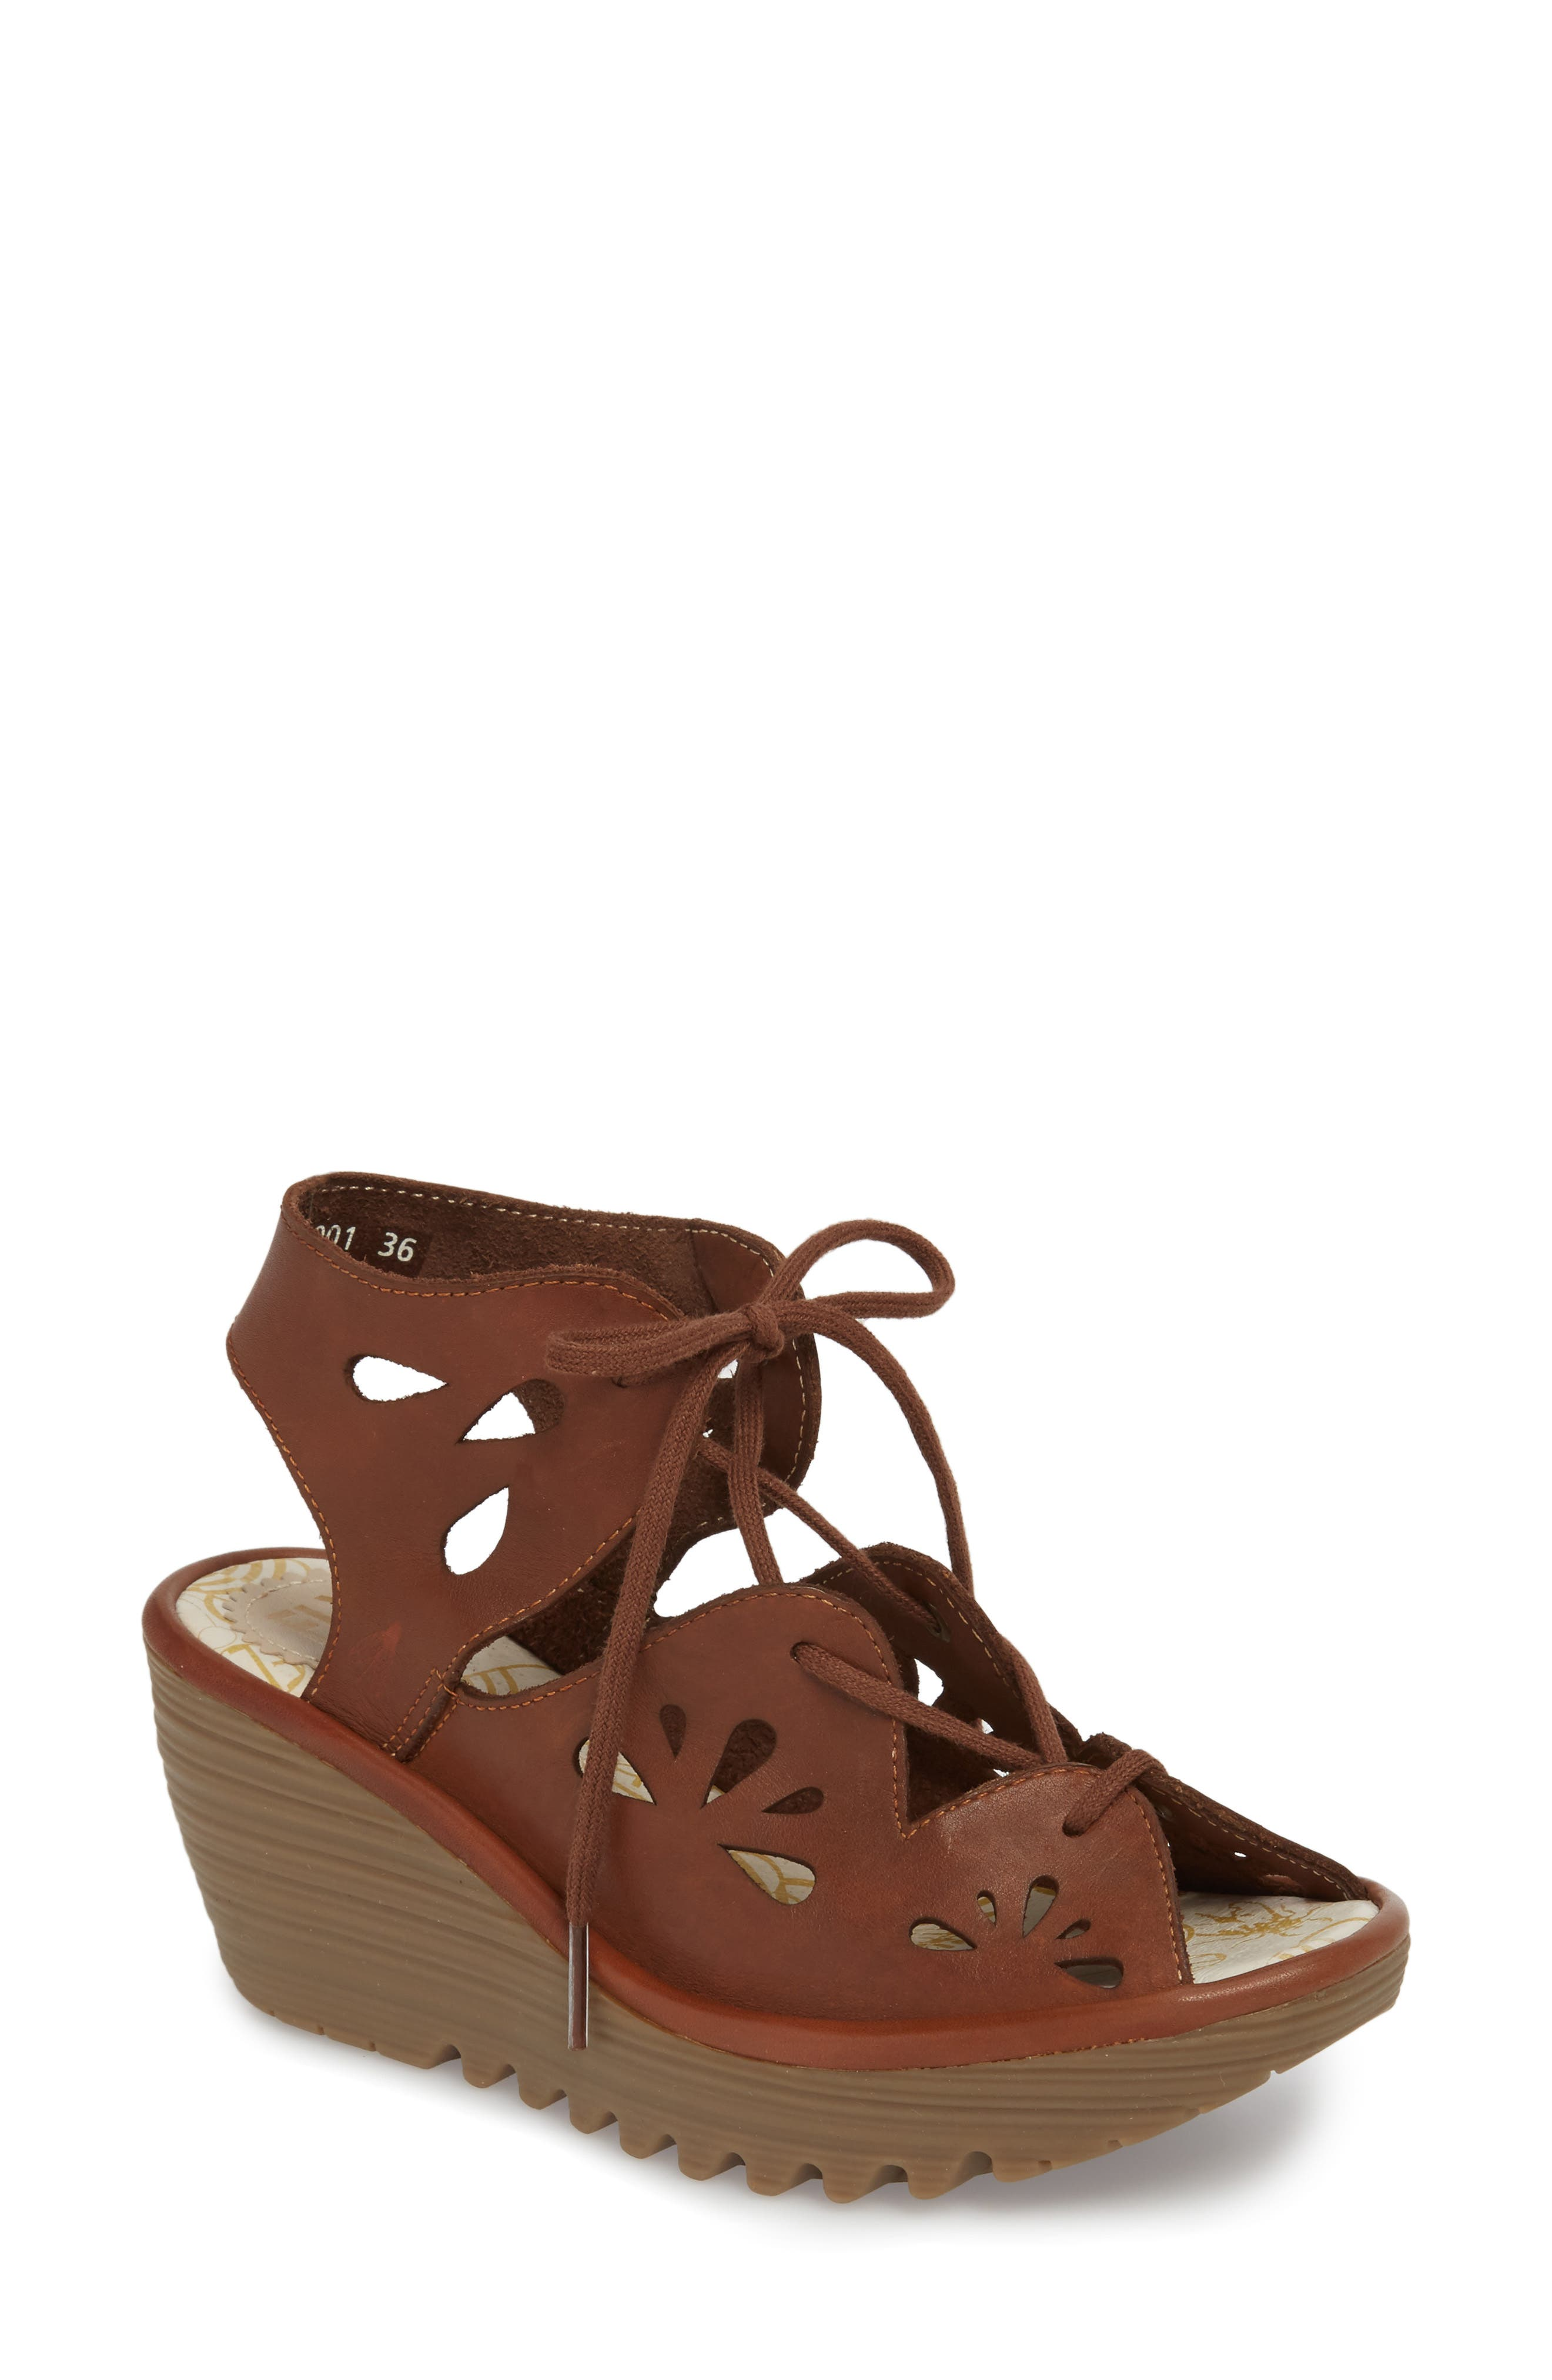 Yote Sandal,                         Main,                         color, Brown Colmar Leather